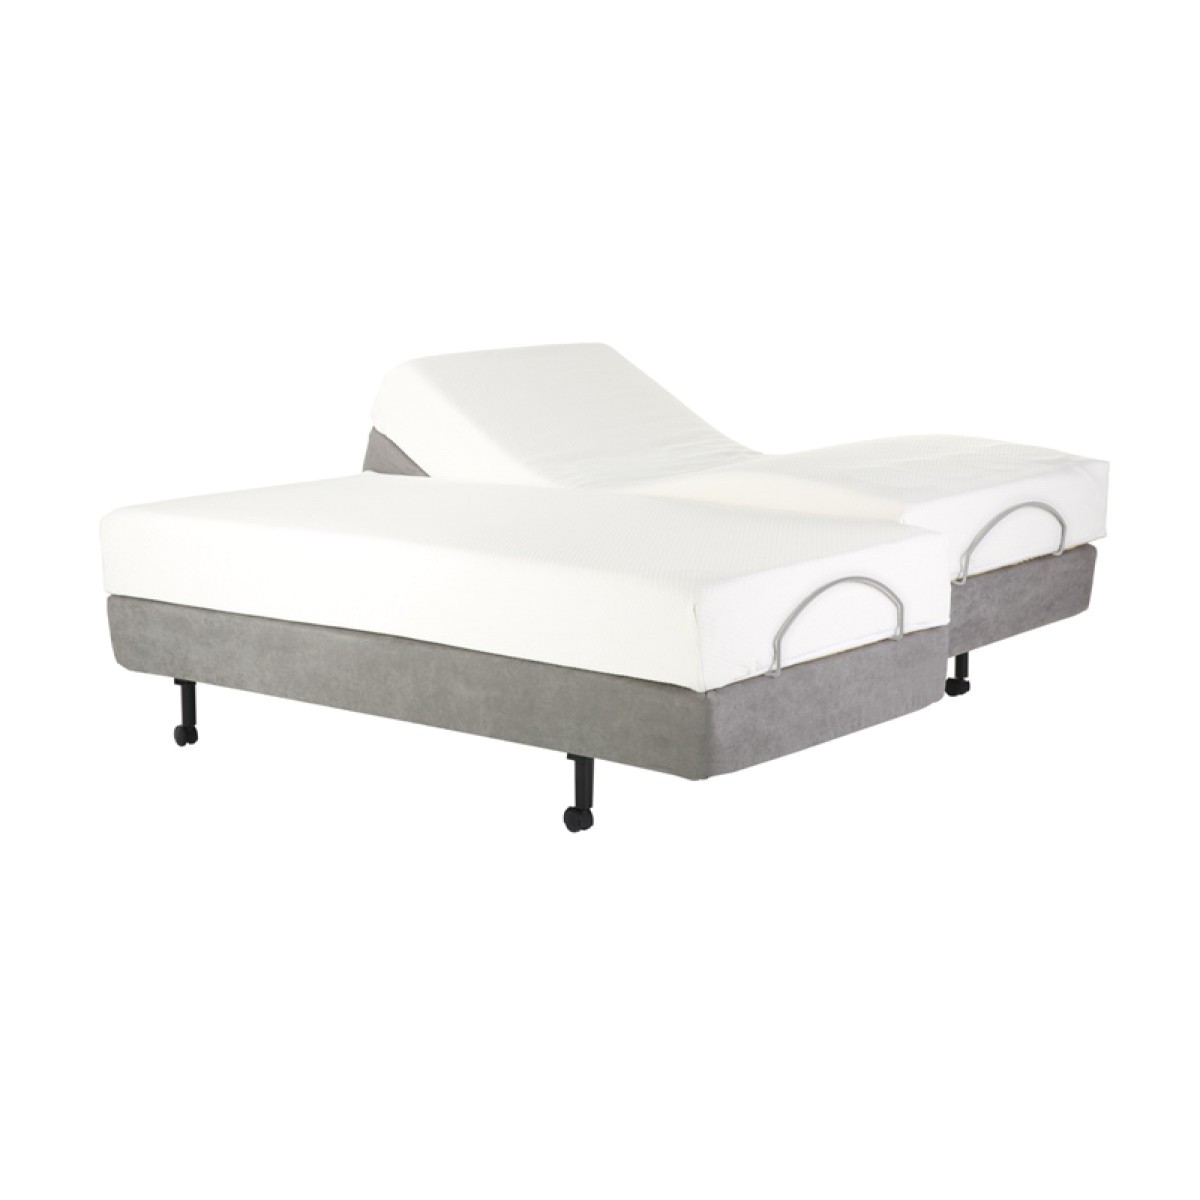 leggett and platt simplicity performance series queen adjustable bed base simplicity queen